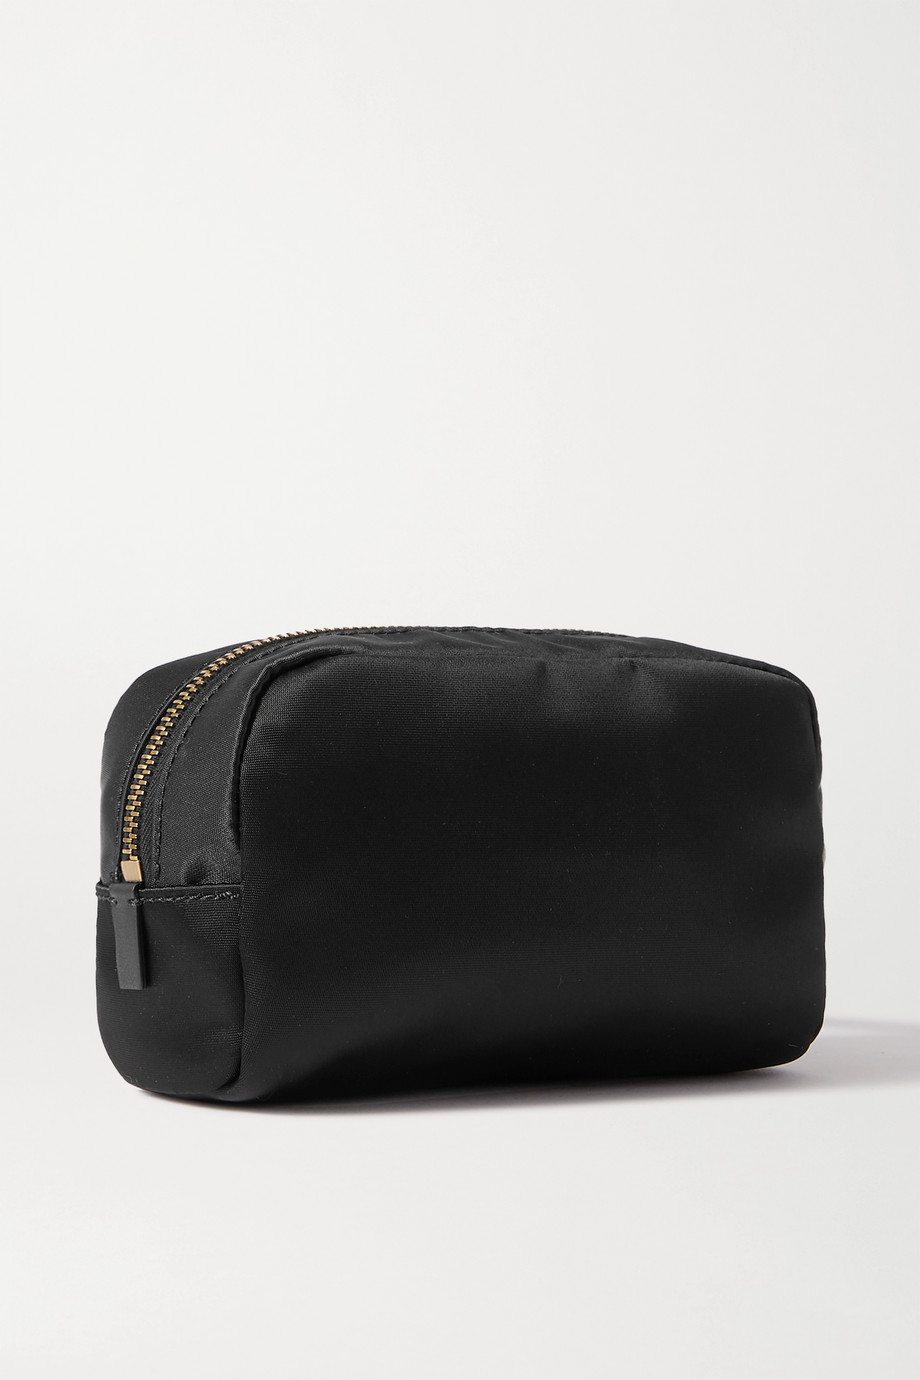 Valentino Valentino Garavani small embellished nylon cosmetics case